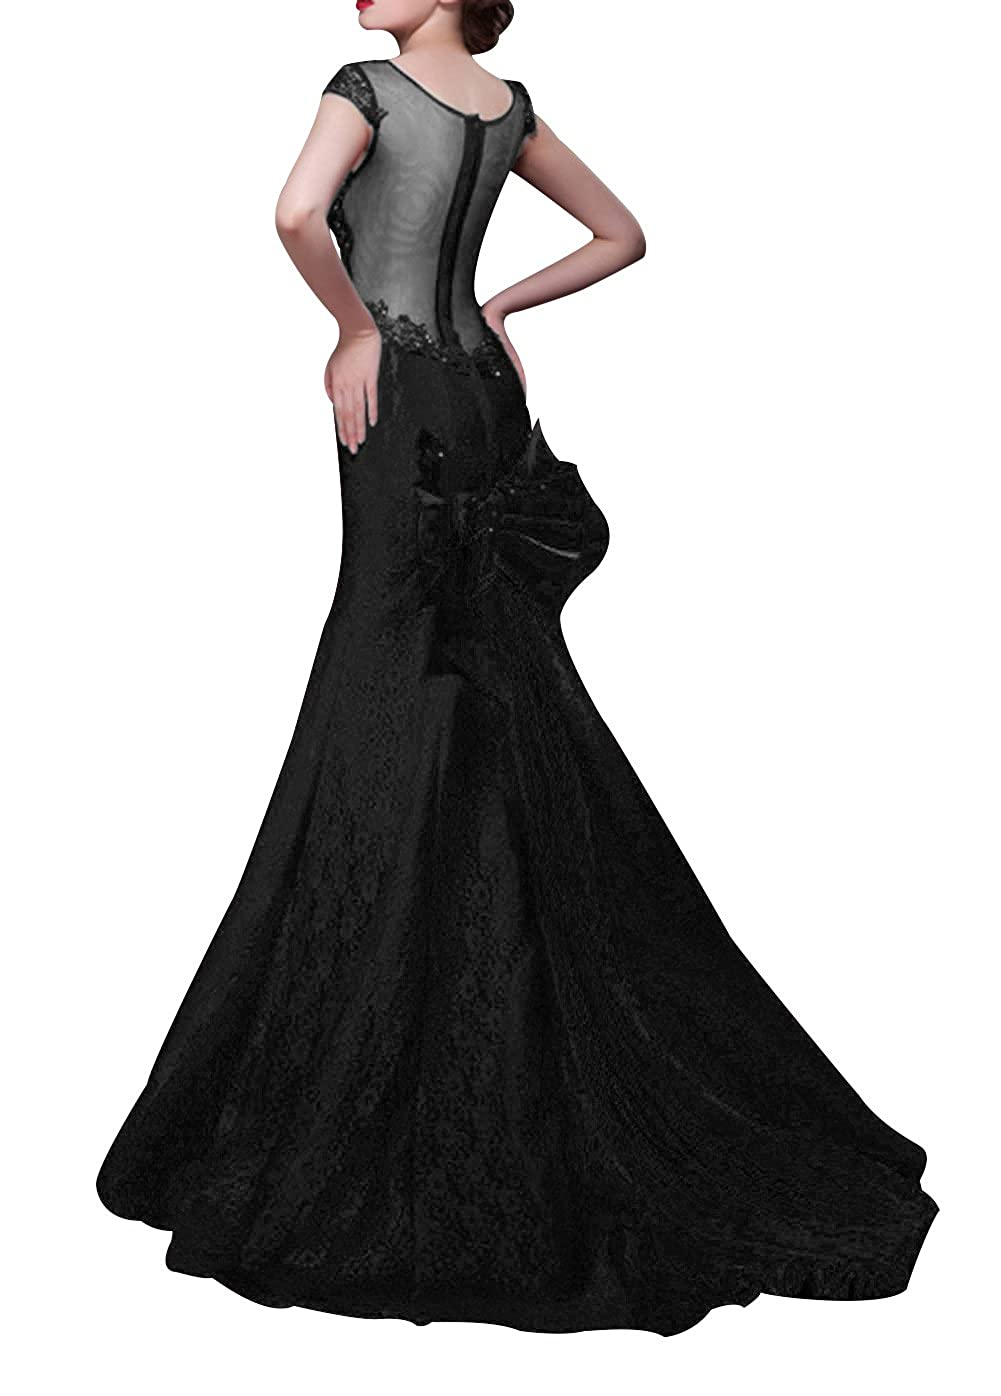 Dapene Womens Round Neck Tunic Bowknot Mermaid Formal Dress 6 US Black